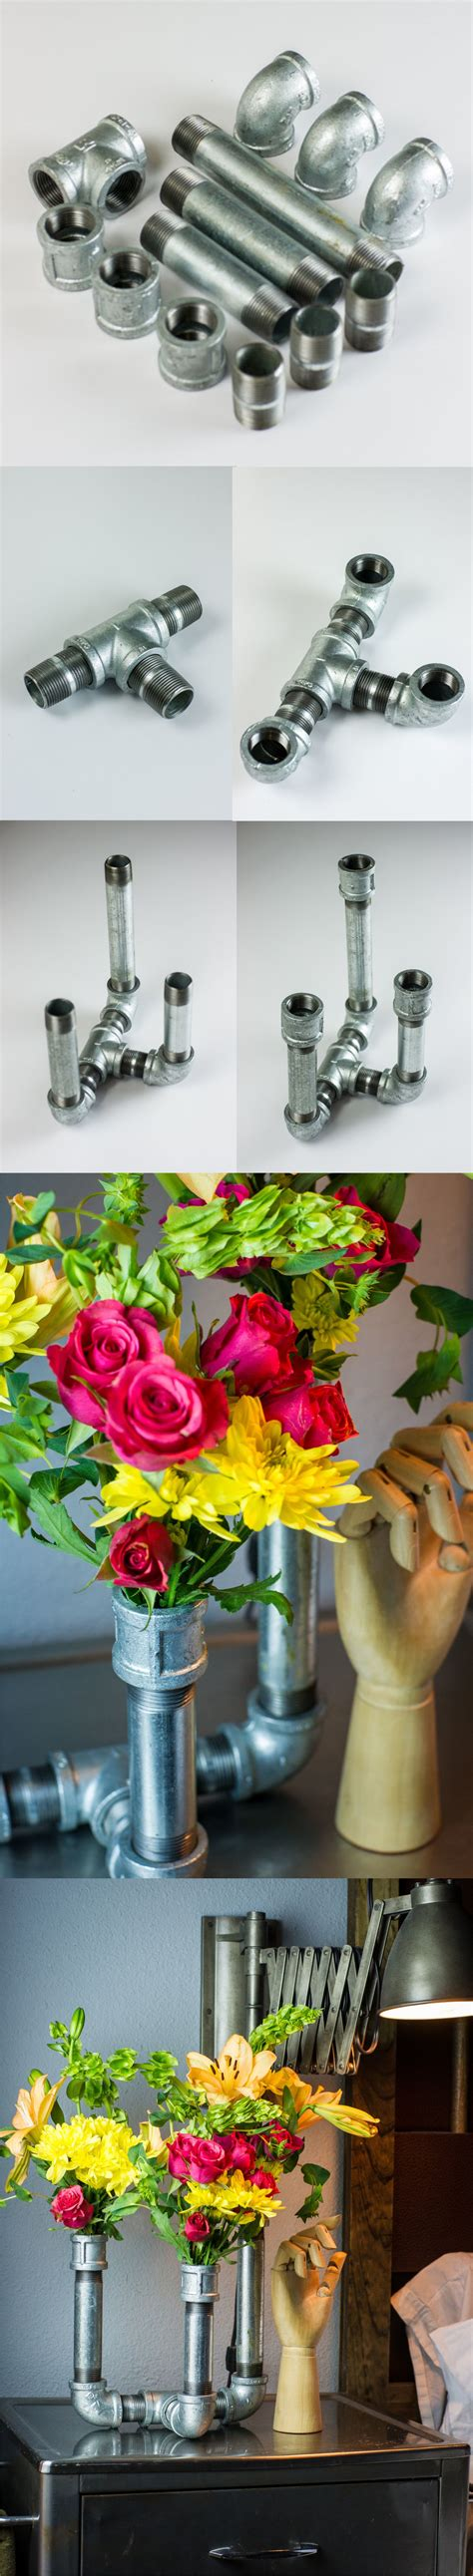 floreros galvanizados florero con tubos galvanizados tubo galvanizado